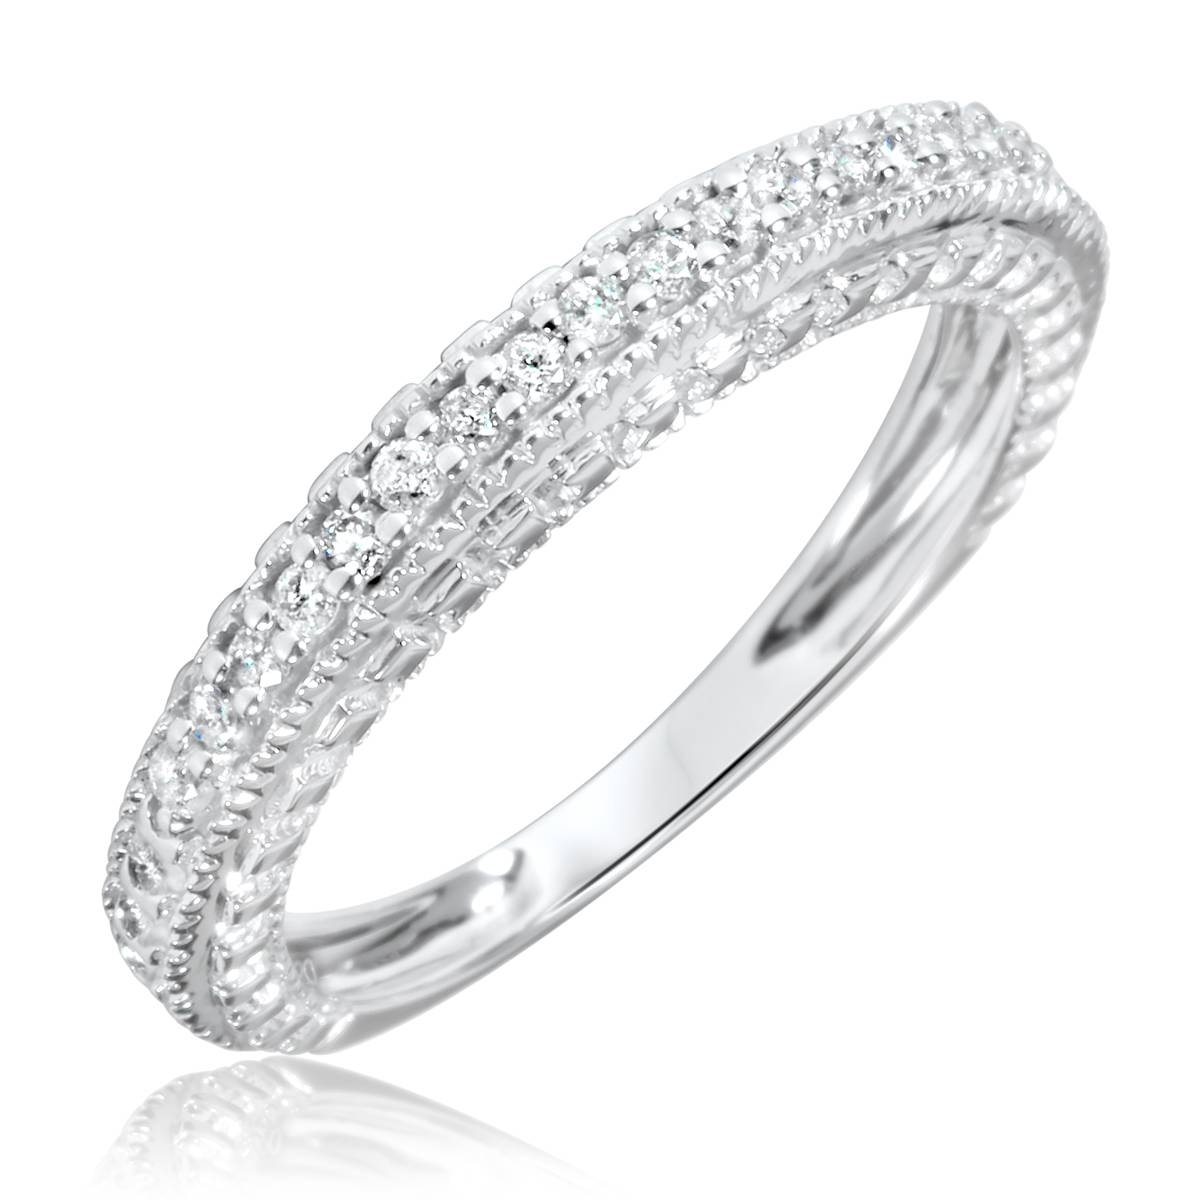 1 Carat Diamond Trio Wedding Ring Set 14K White Gold Pertaining To White Gold Wedding Bands For Women (Gallery 13 of 15)